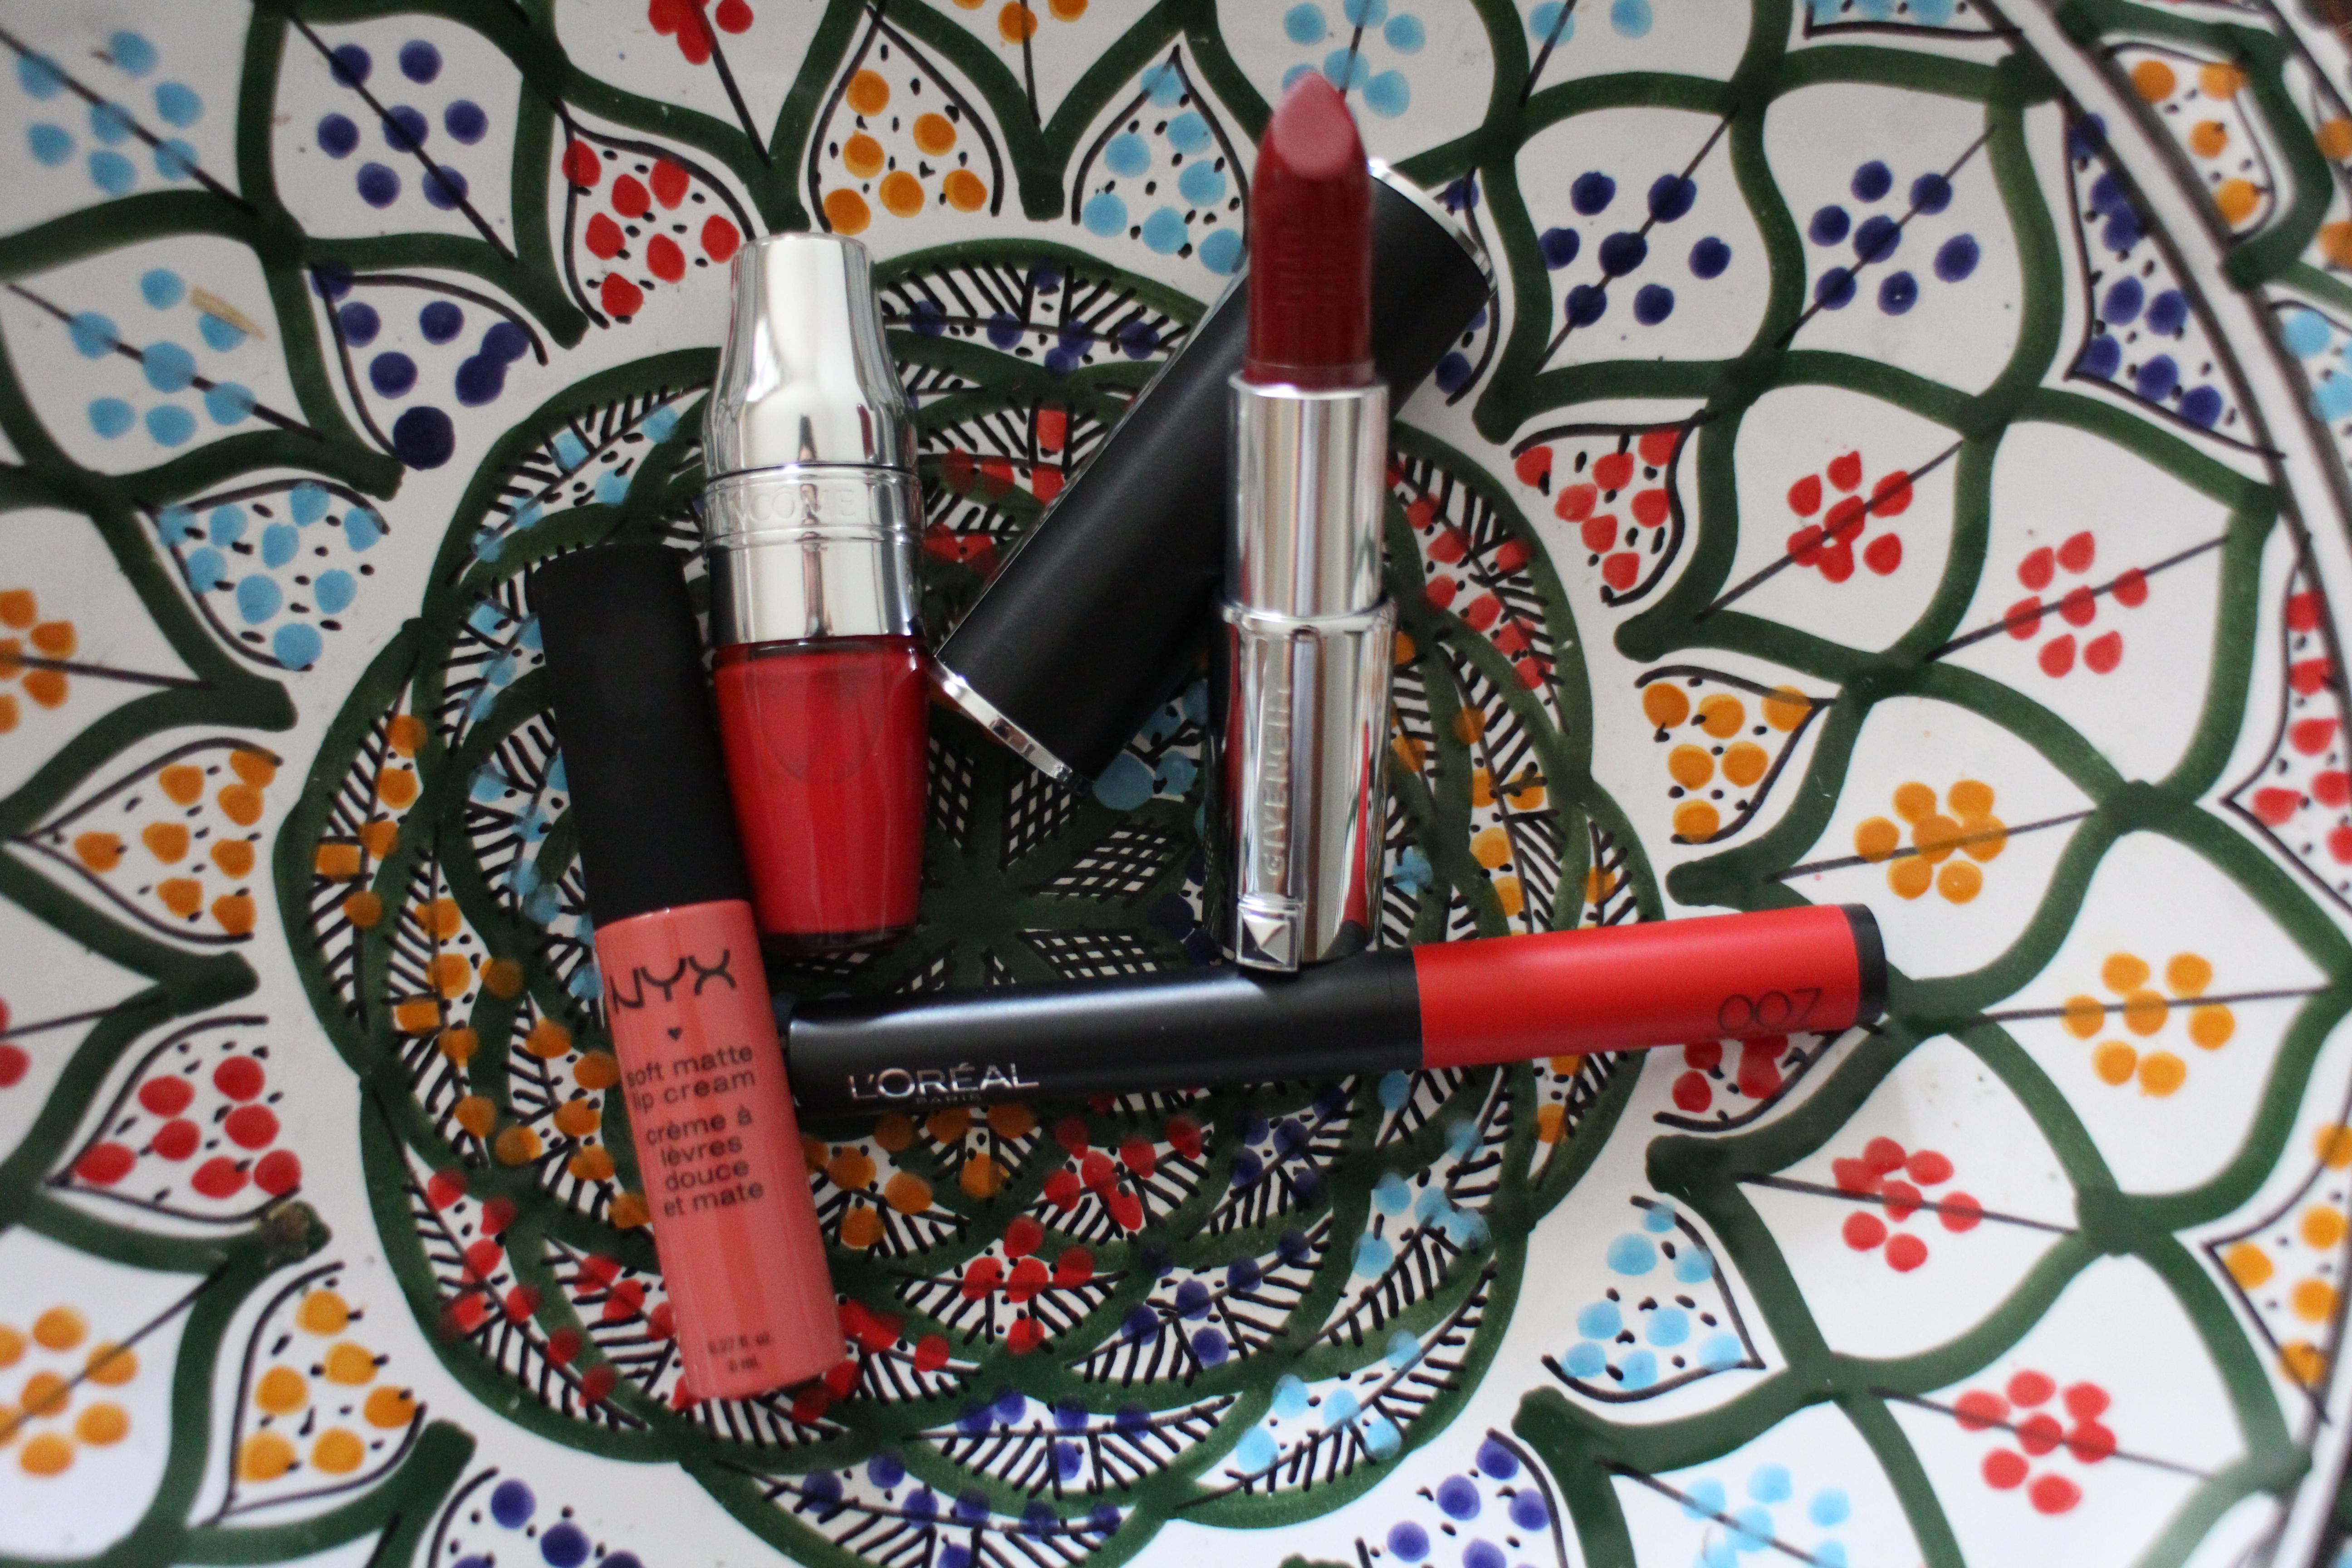 #BOTY2016 - catégorie lipstick